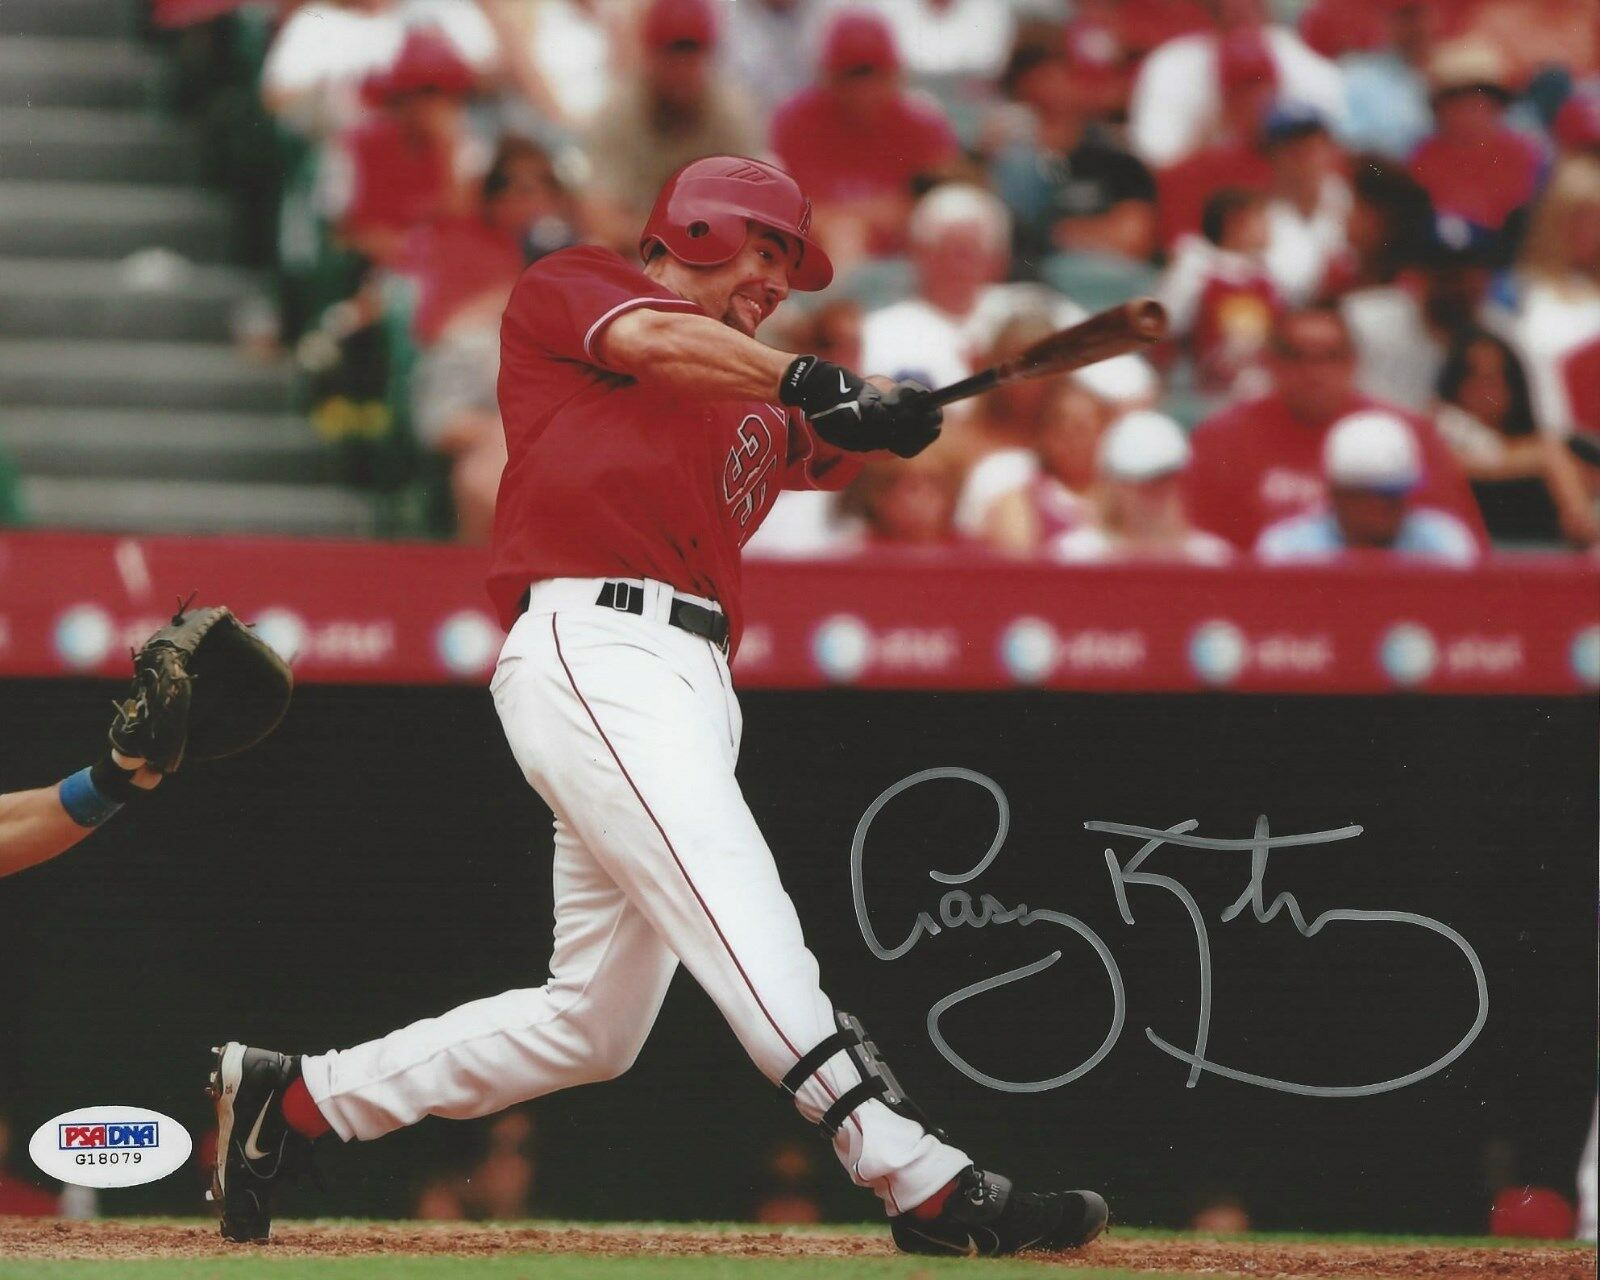 Casey Kotchman Anaheim Angels signed 8x10 PSA/DNA # G18079